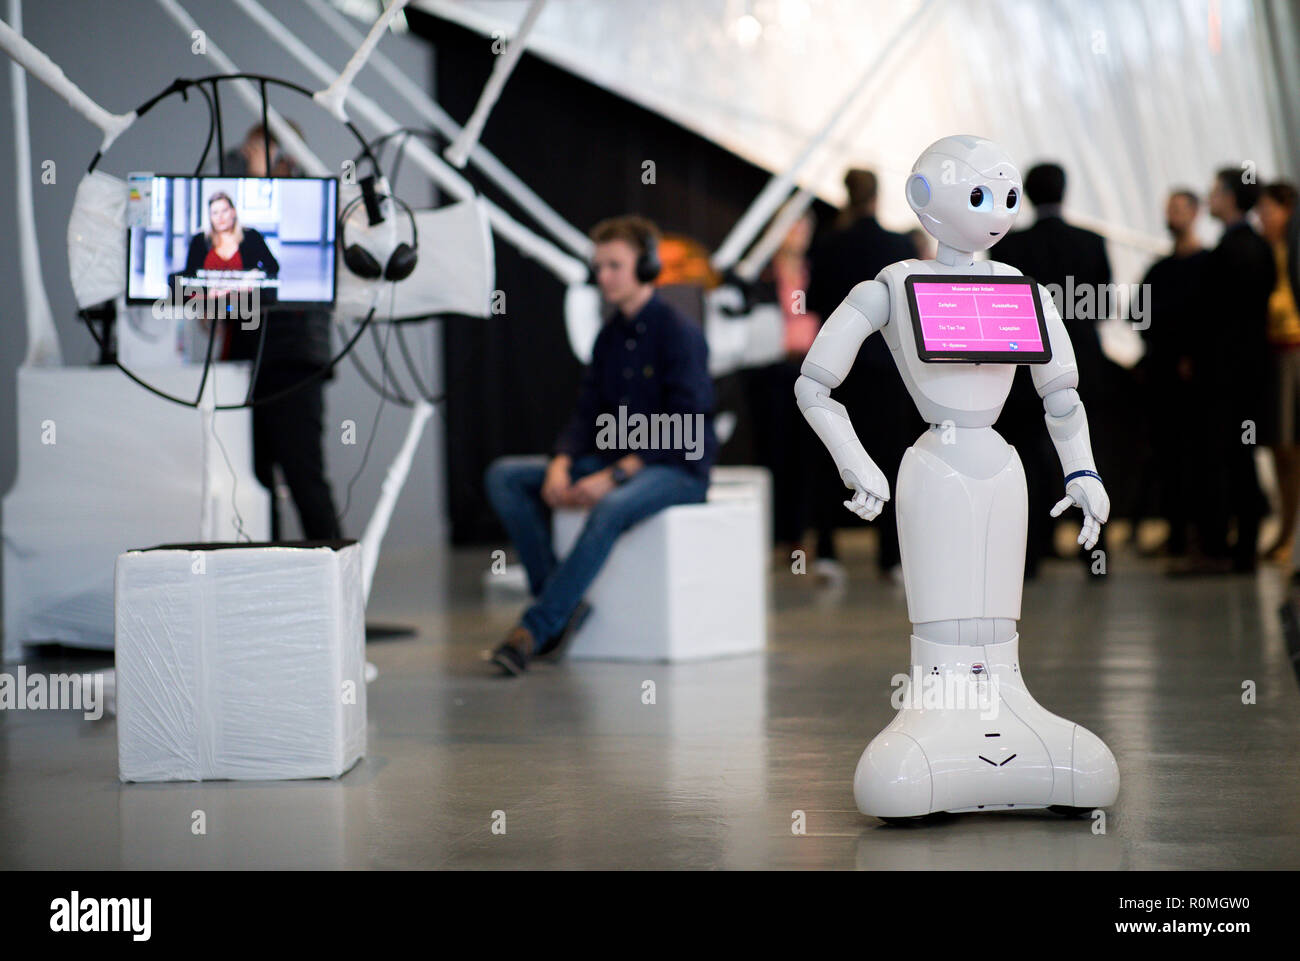 robot datazione in futuro differenza di età in regola di datazione